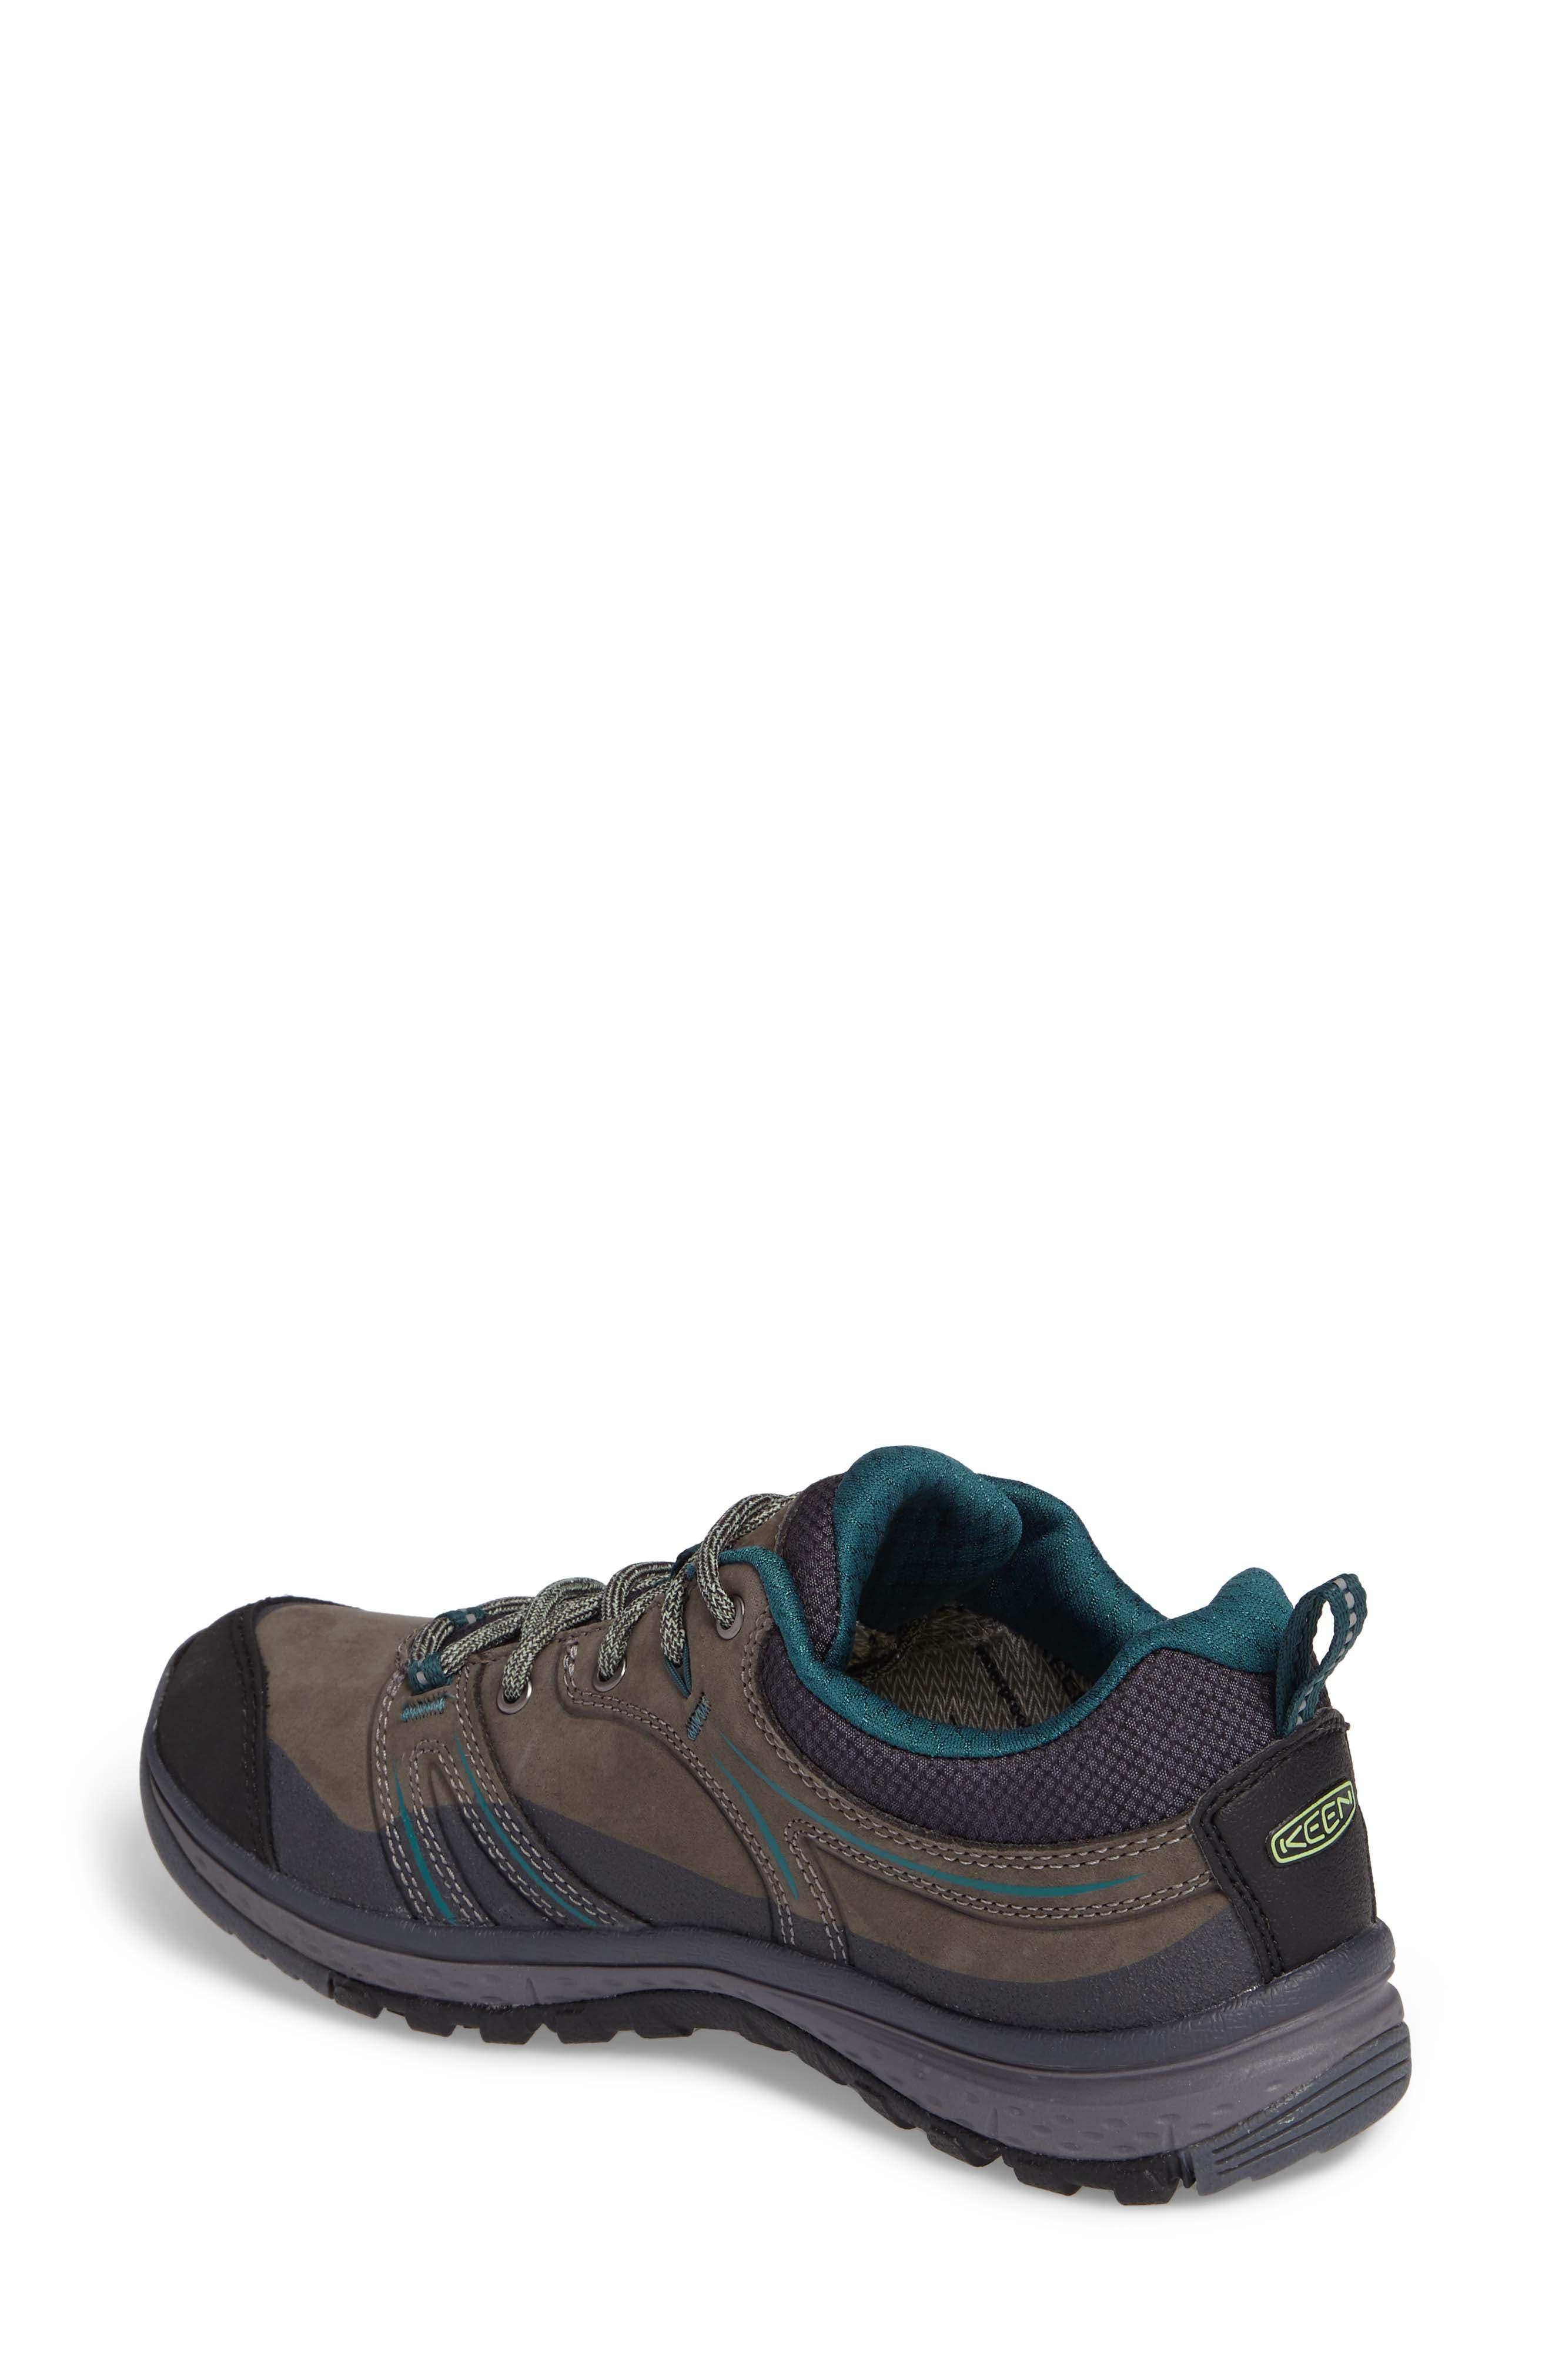 Terradora Waterproof Hiking Shoe,                             Alternate thumbnail 5, color,